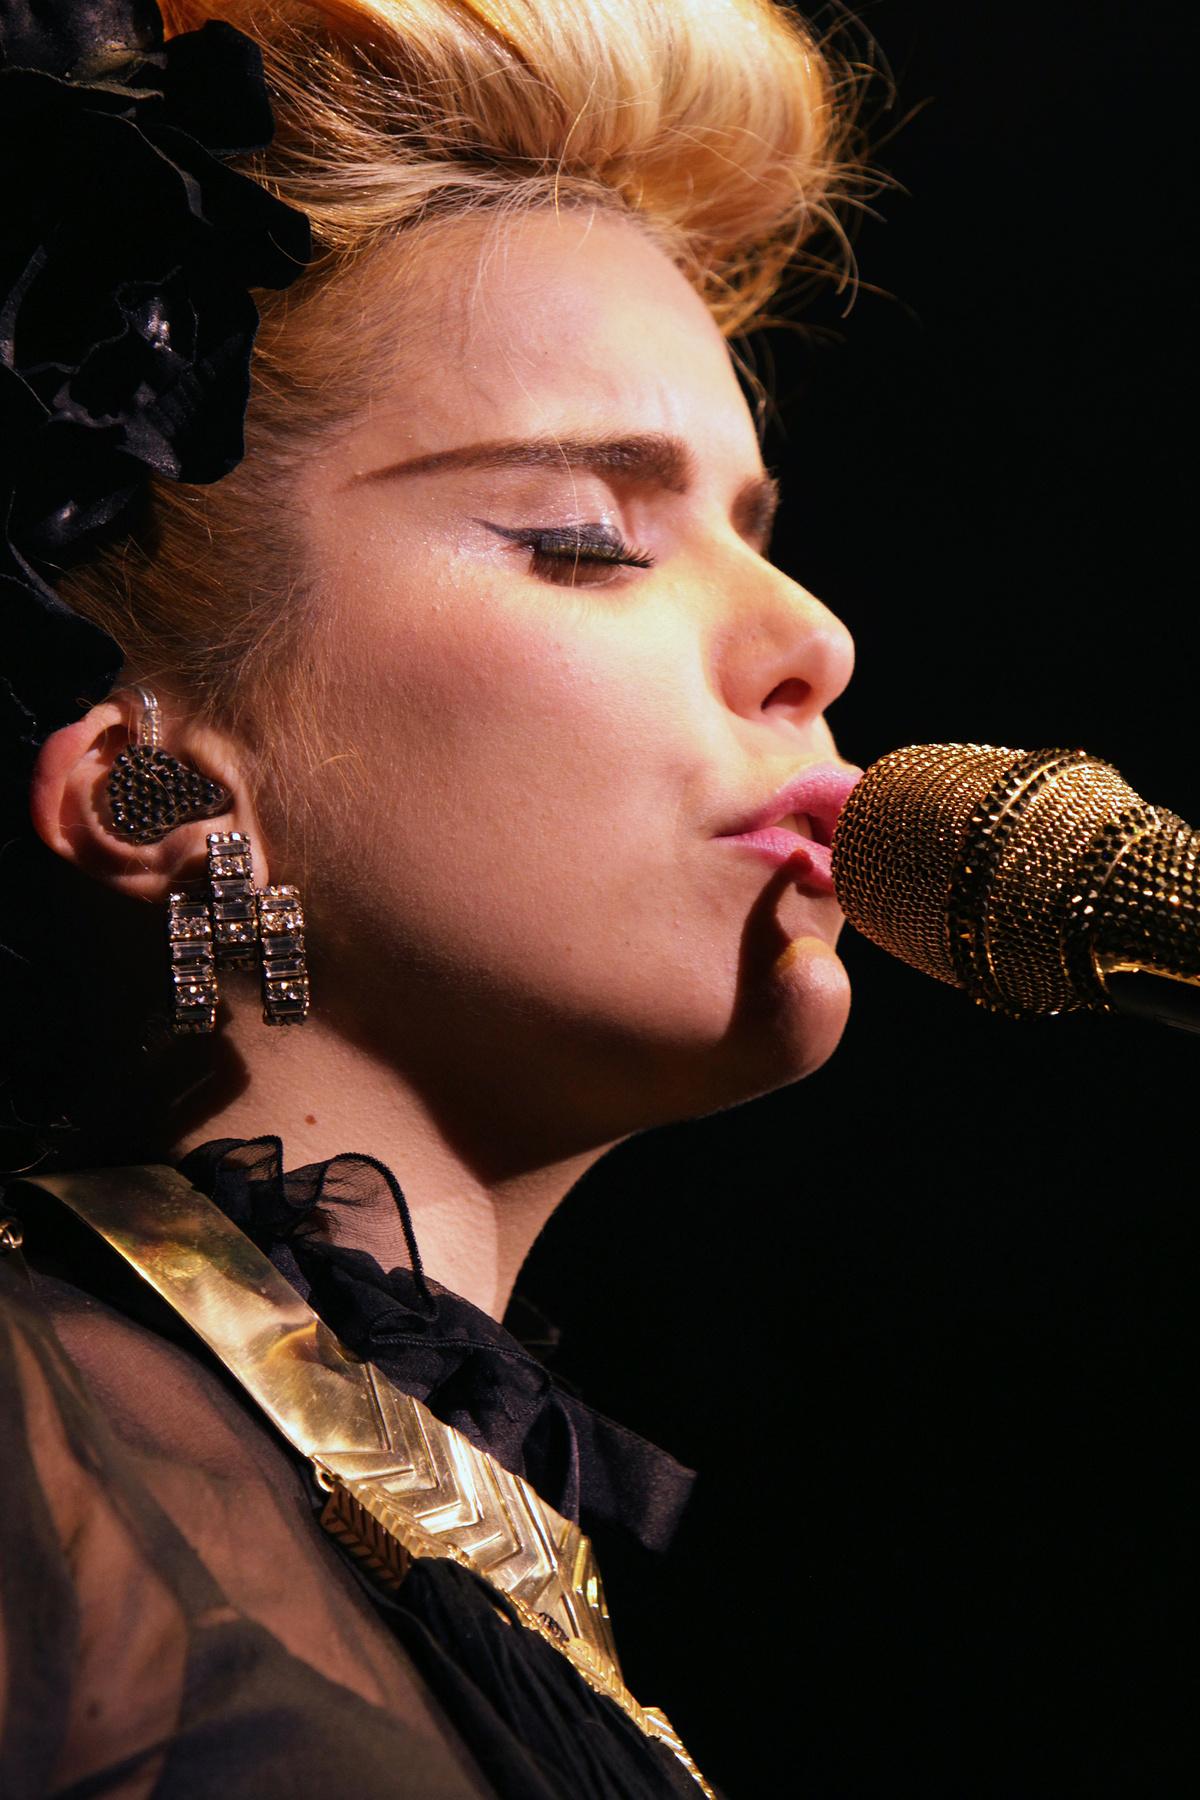 Paloma Faith Live at Leeds O2 January 27th 2013